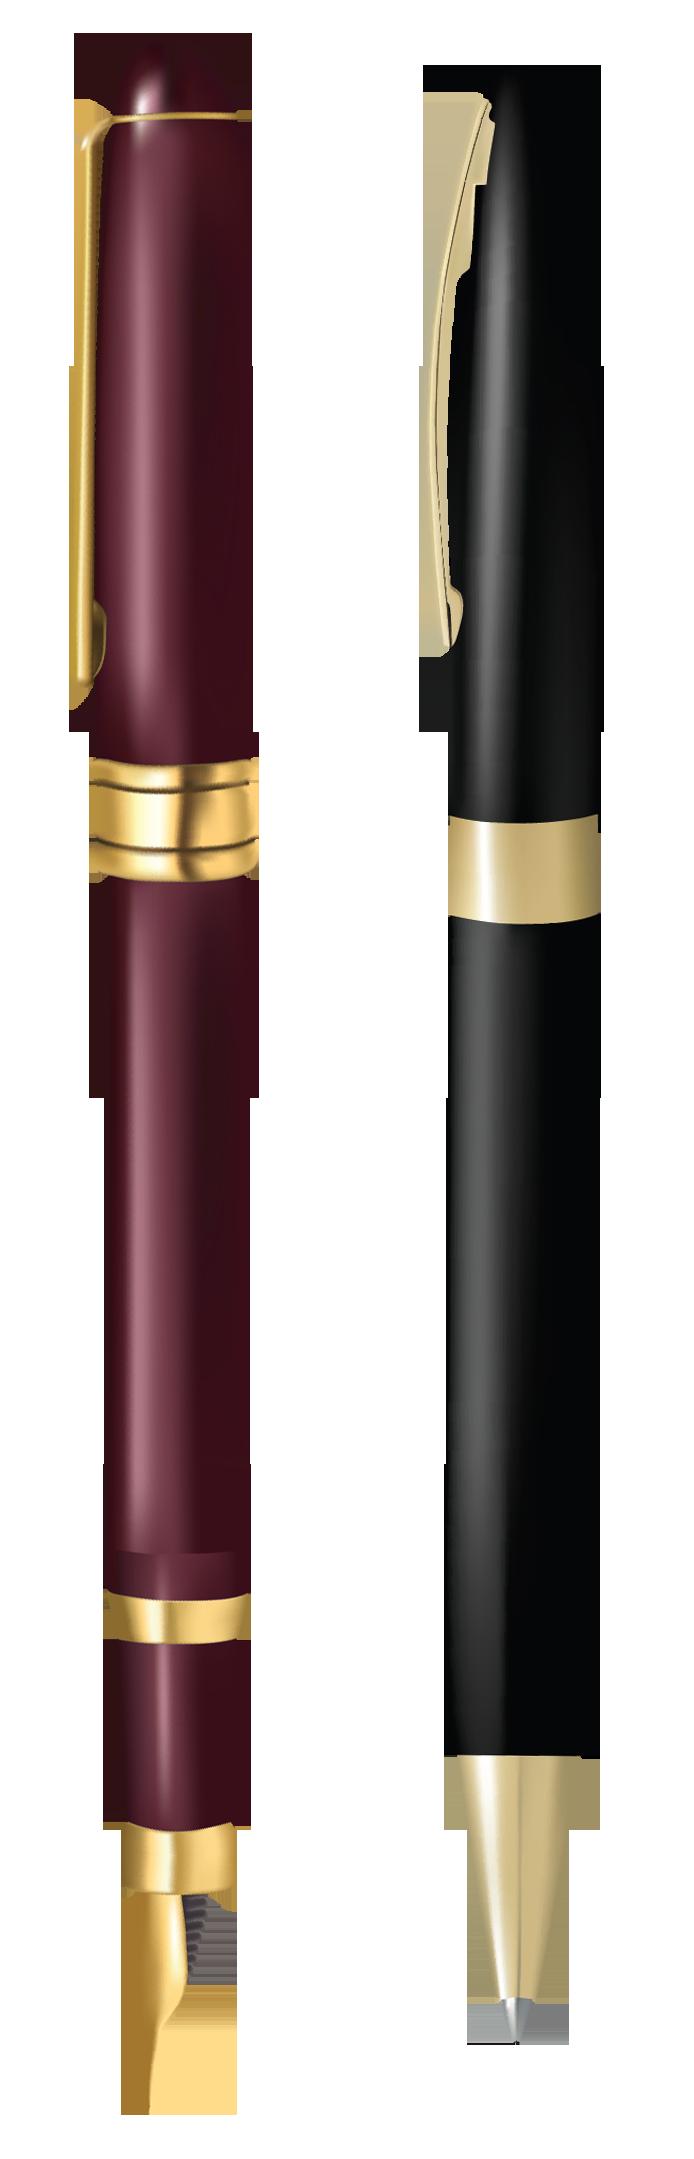 Pen and Ballpoint Pen PNG Clipart.